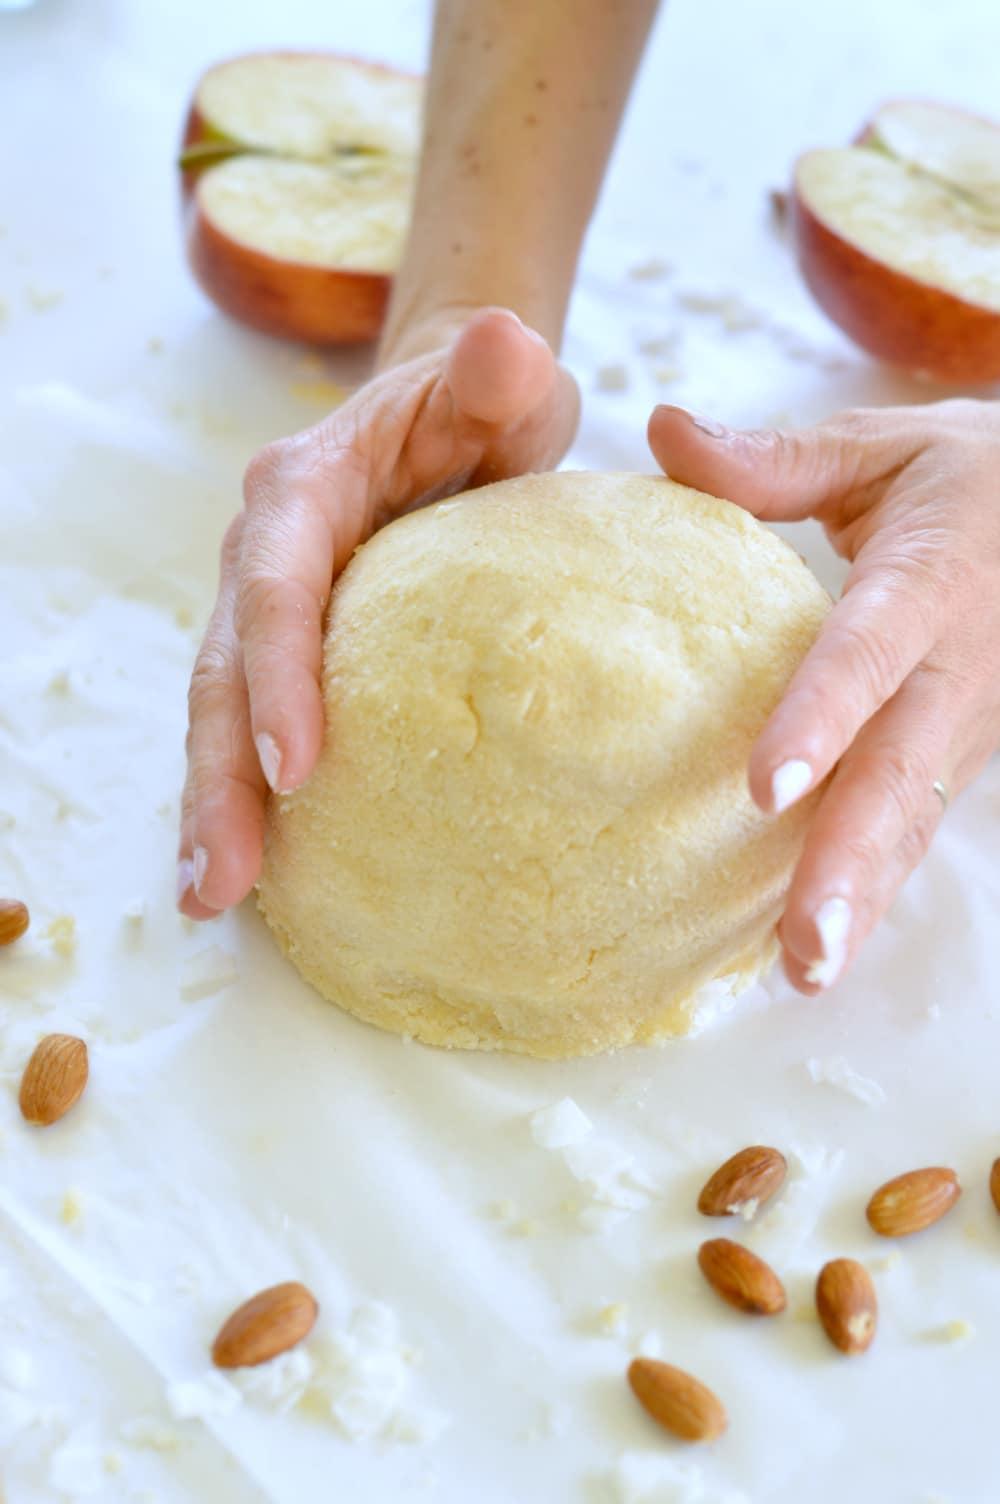 KETO SWEET PIE CRUTS gluten free #keto #crust #lowcarb #glutenfree #healthy #4ingredients #easy #ketorecipes #pie #baking